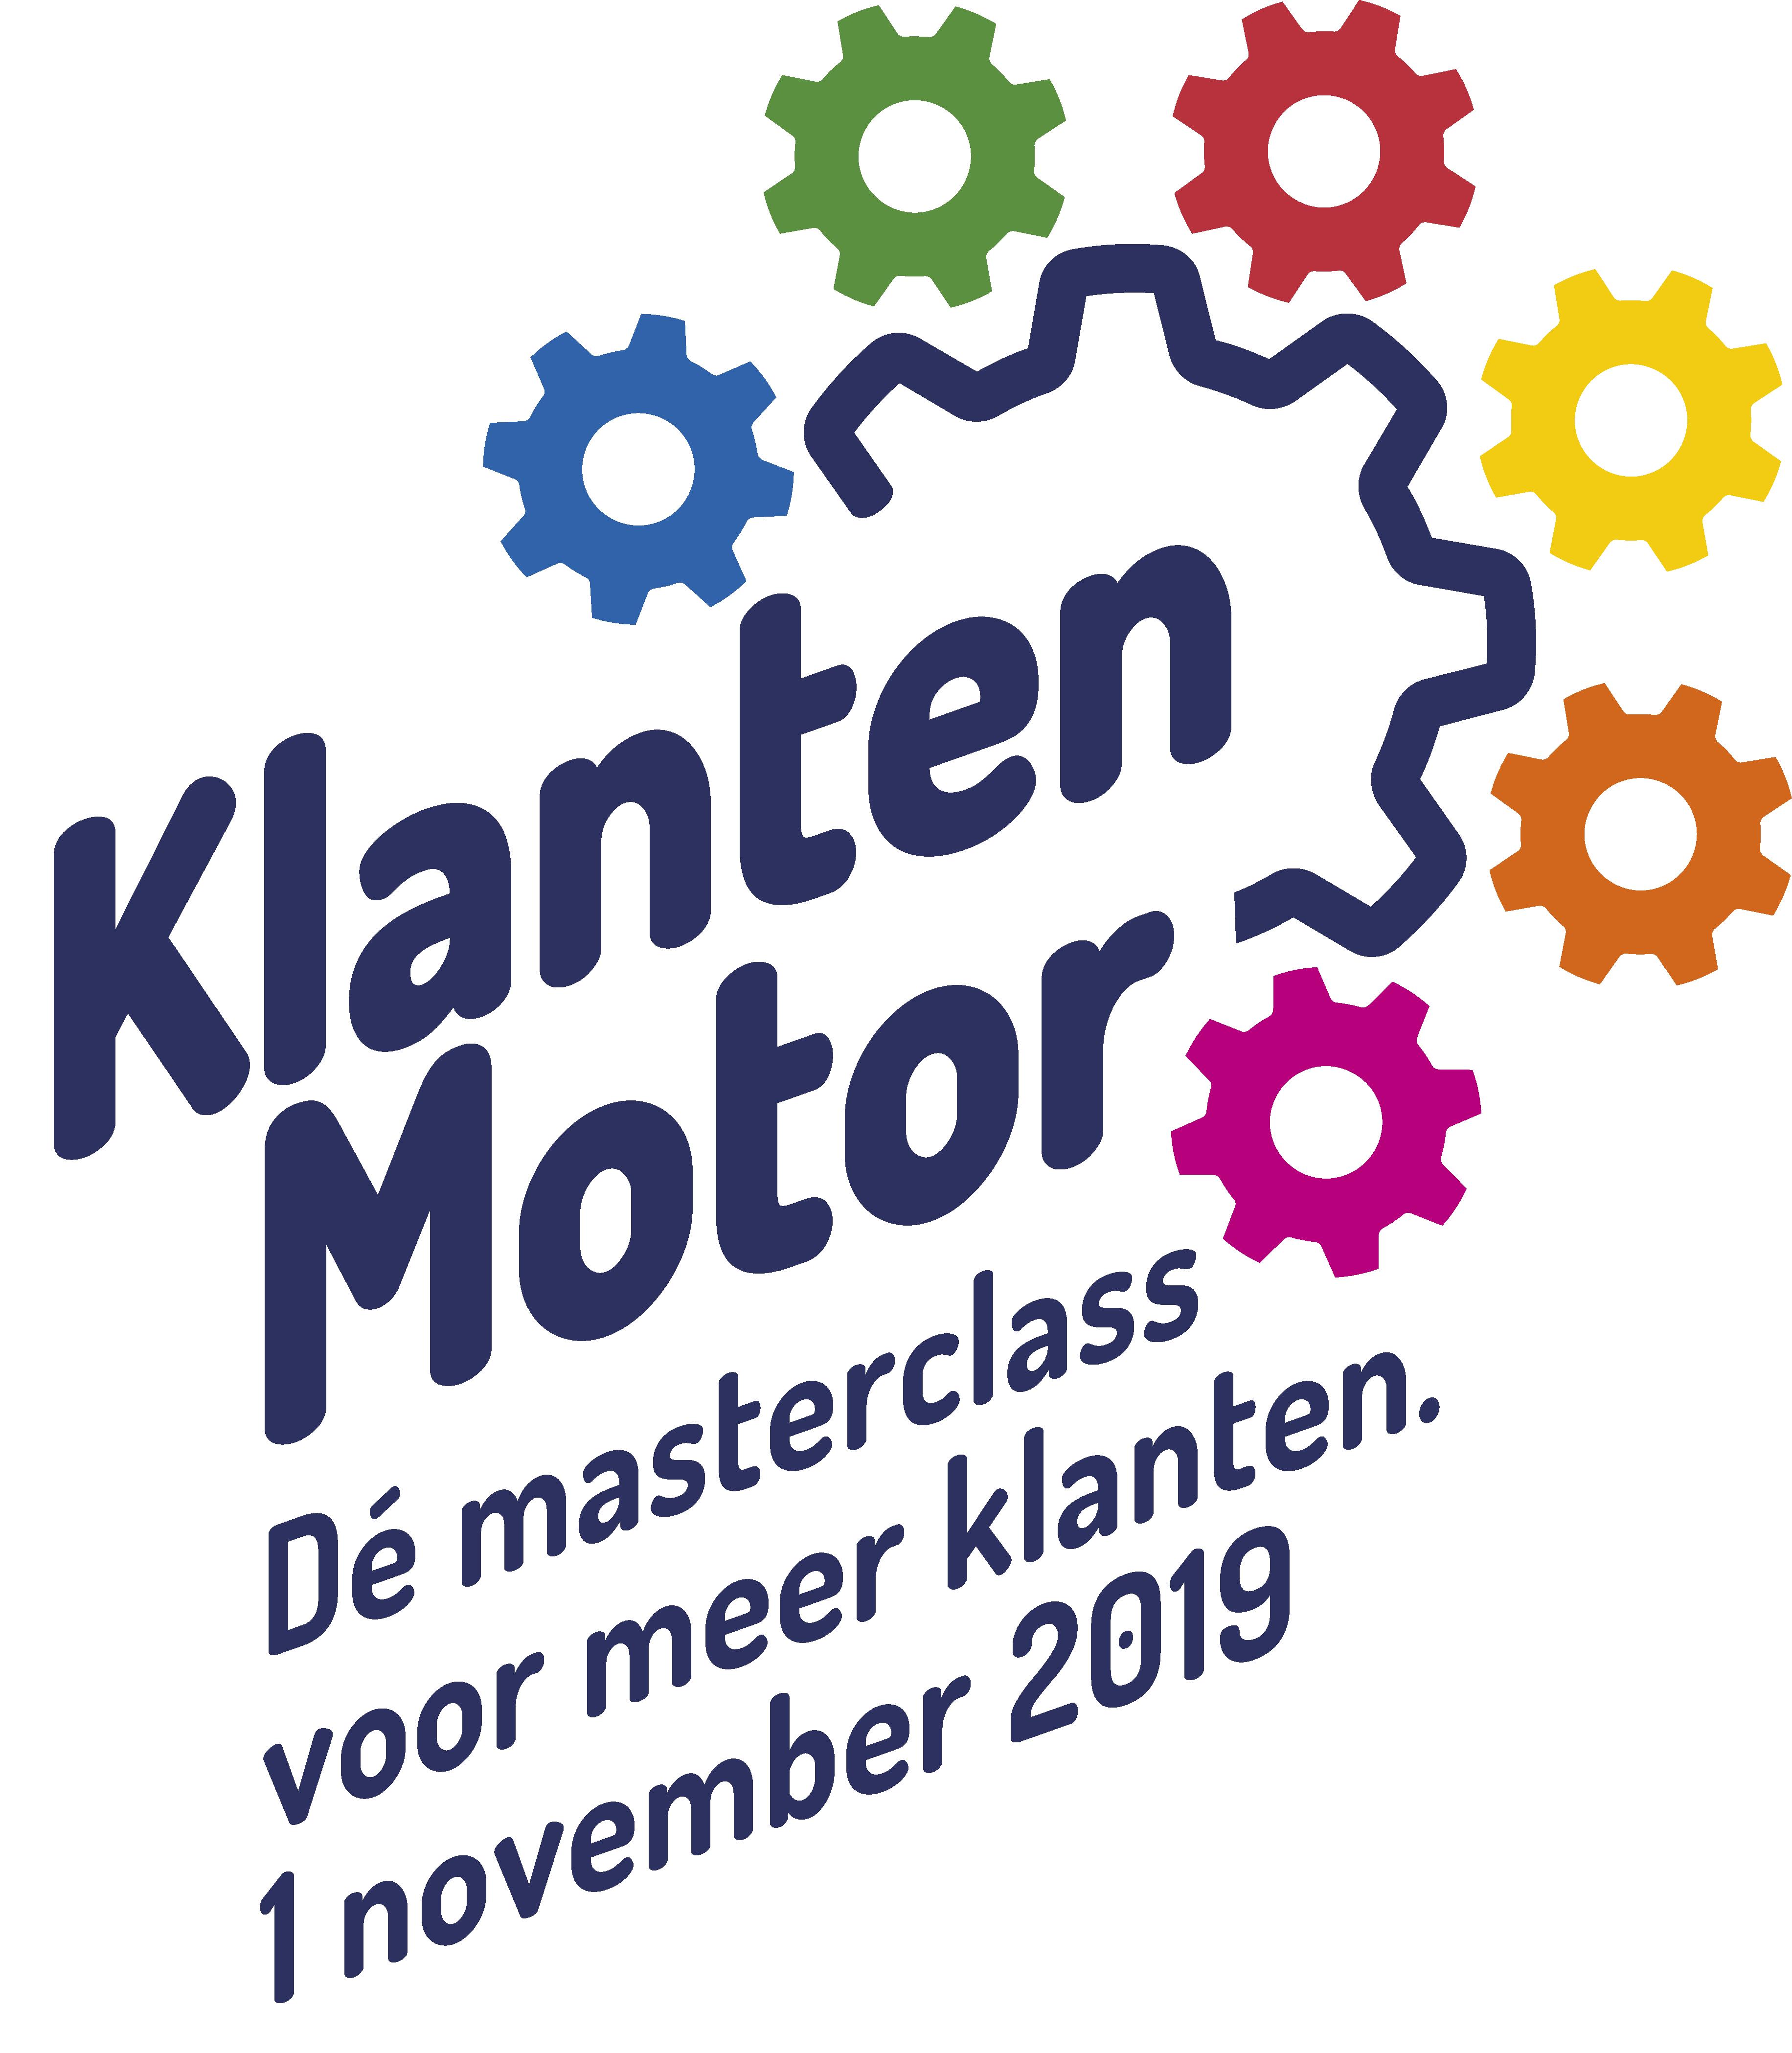 20190917_logo_Patrick_van_Gils